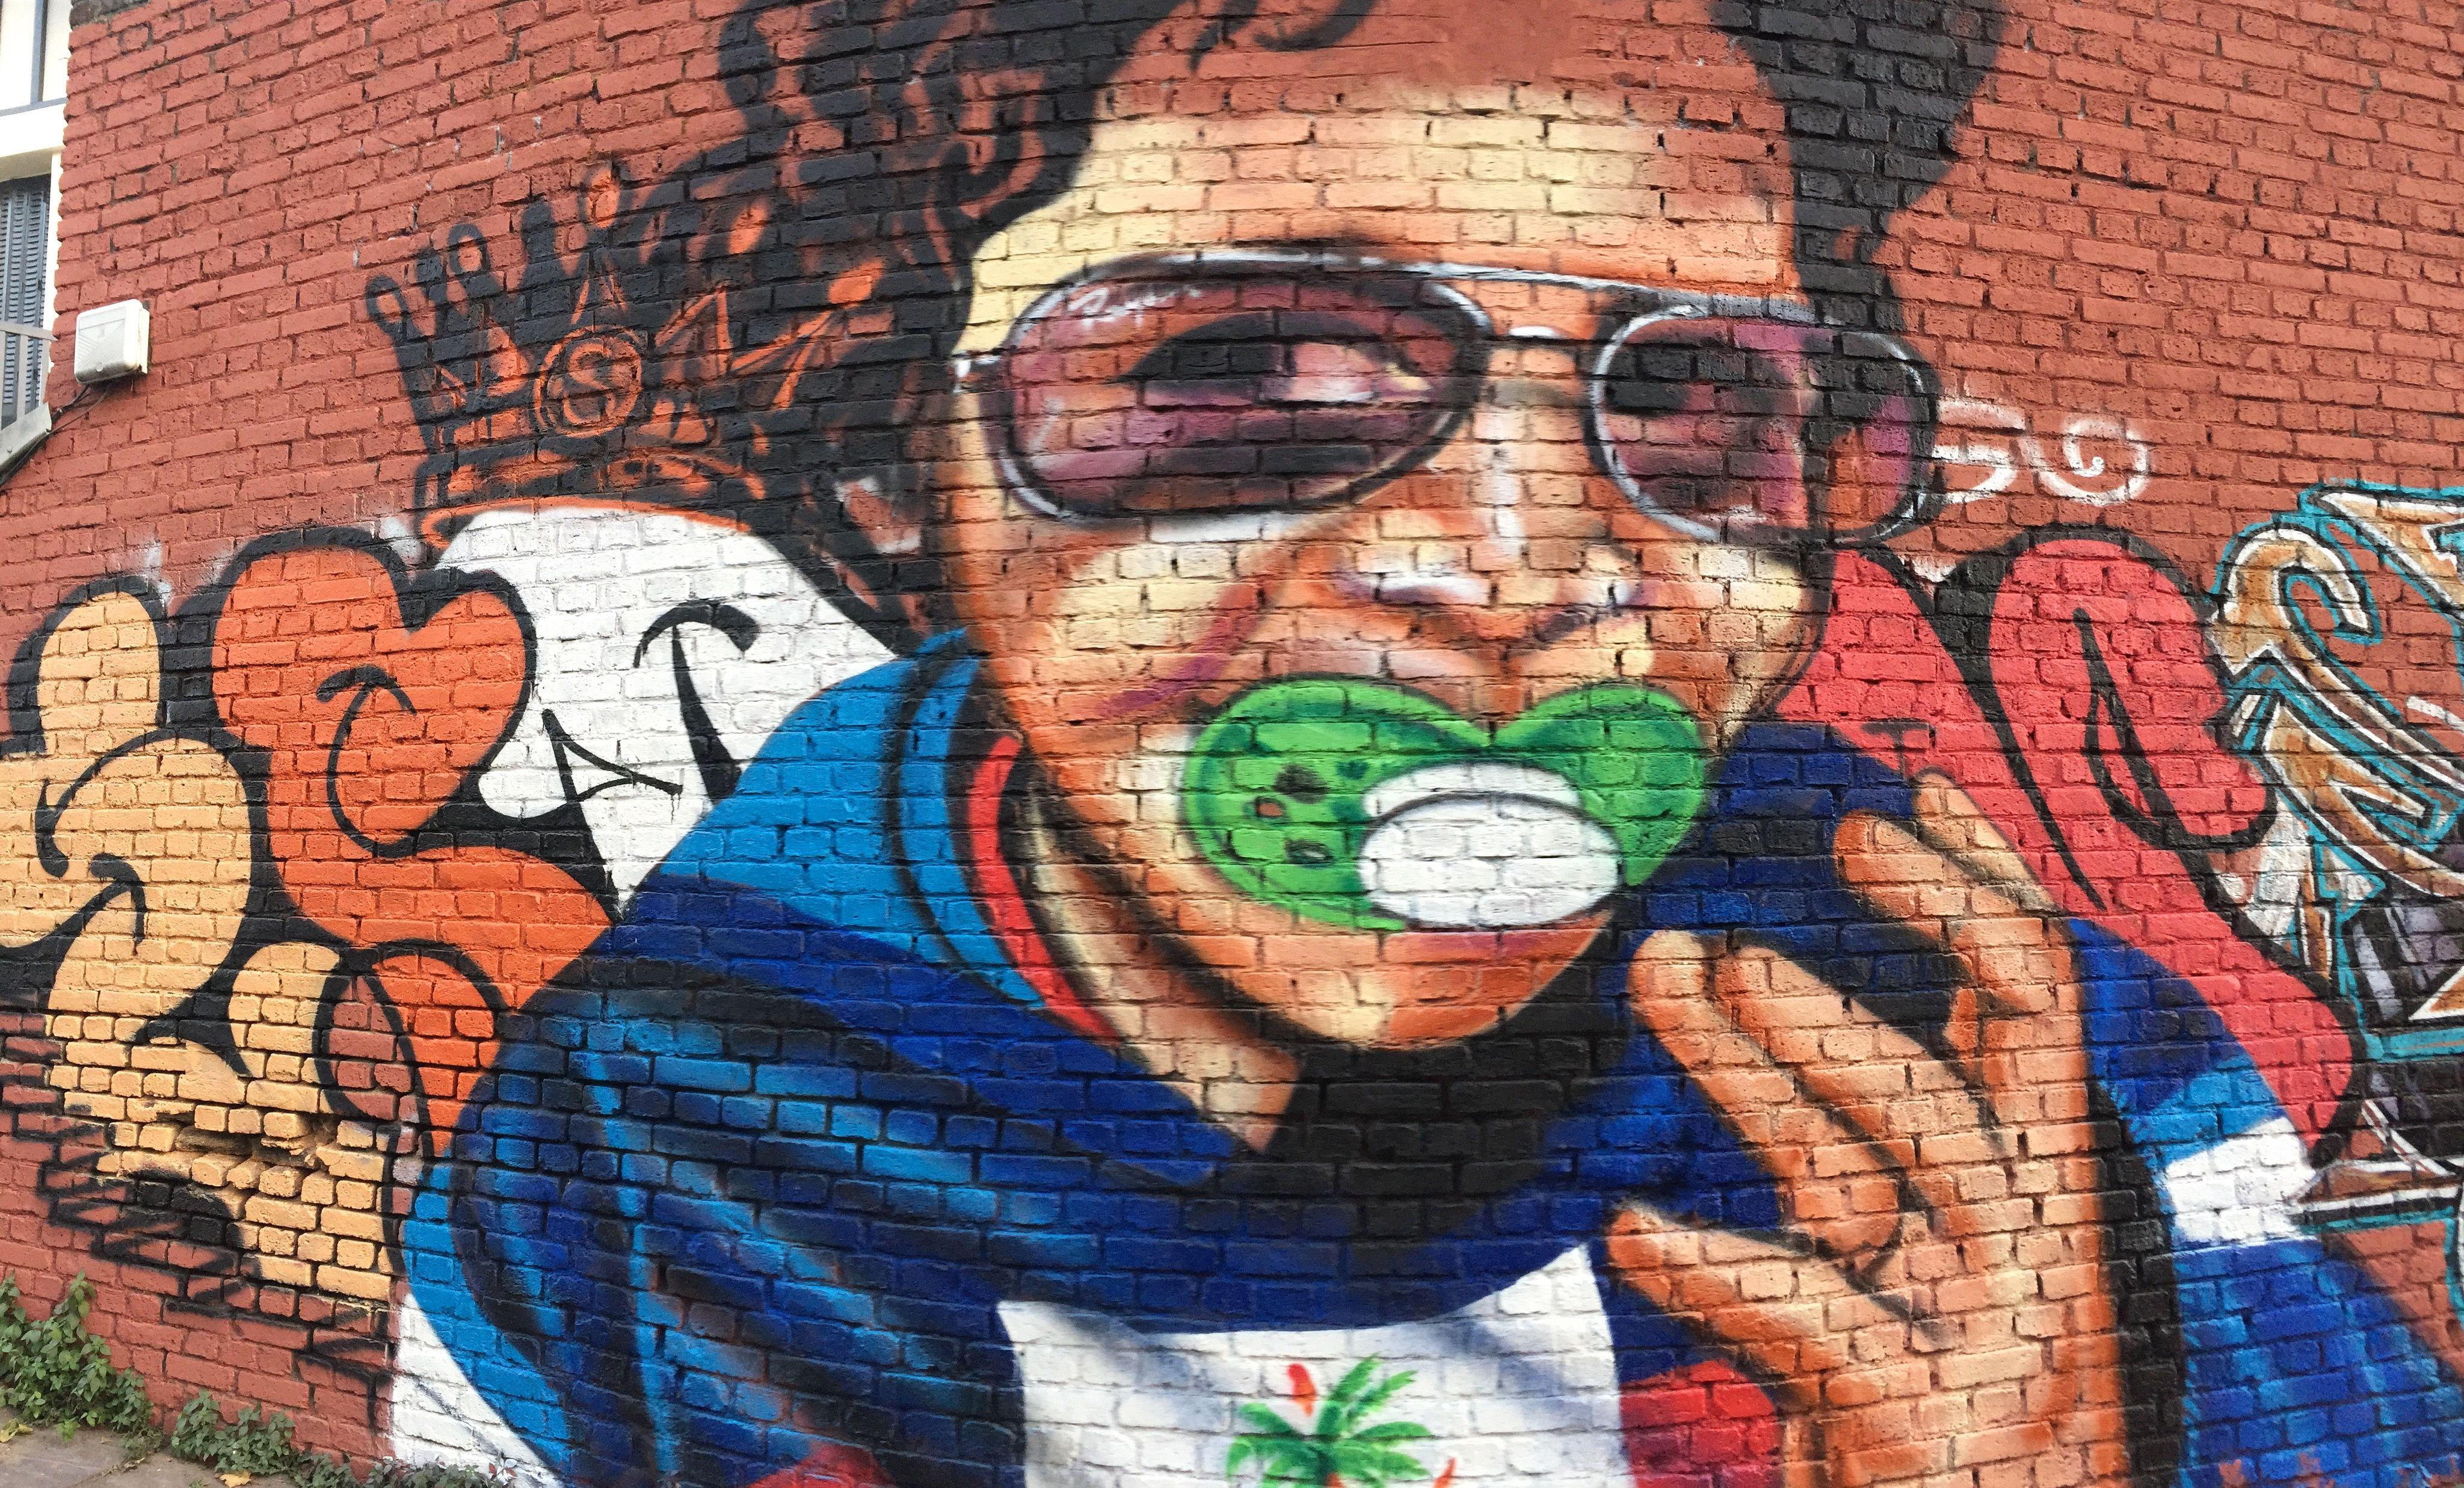 By @espion_graff #ghettoprod #espiongraff #espion  #streetart #graff #graffiti #bombing